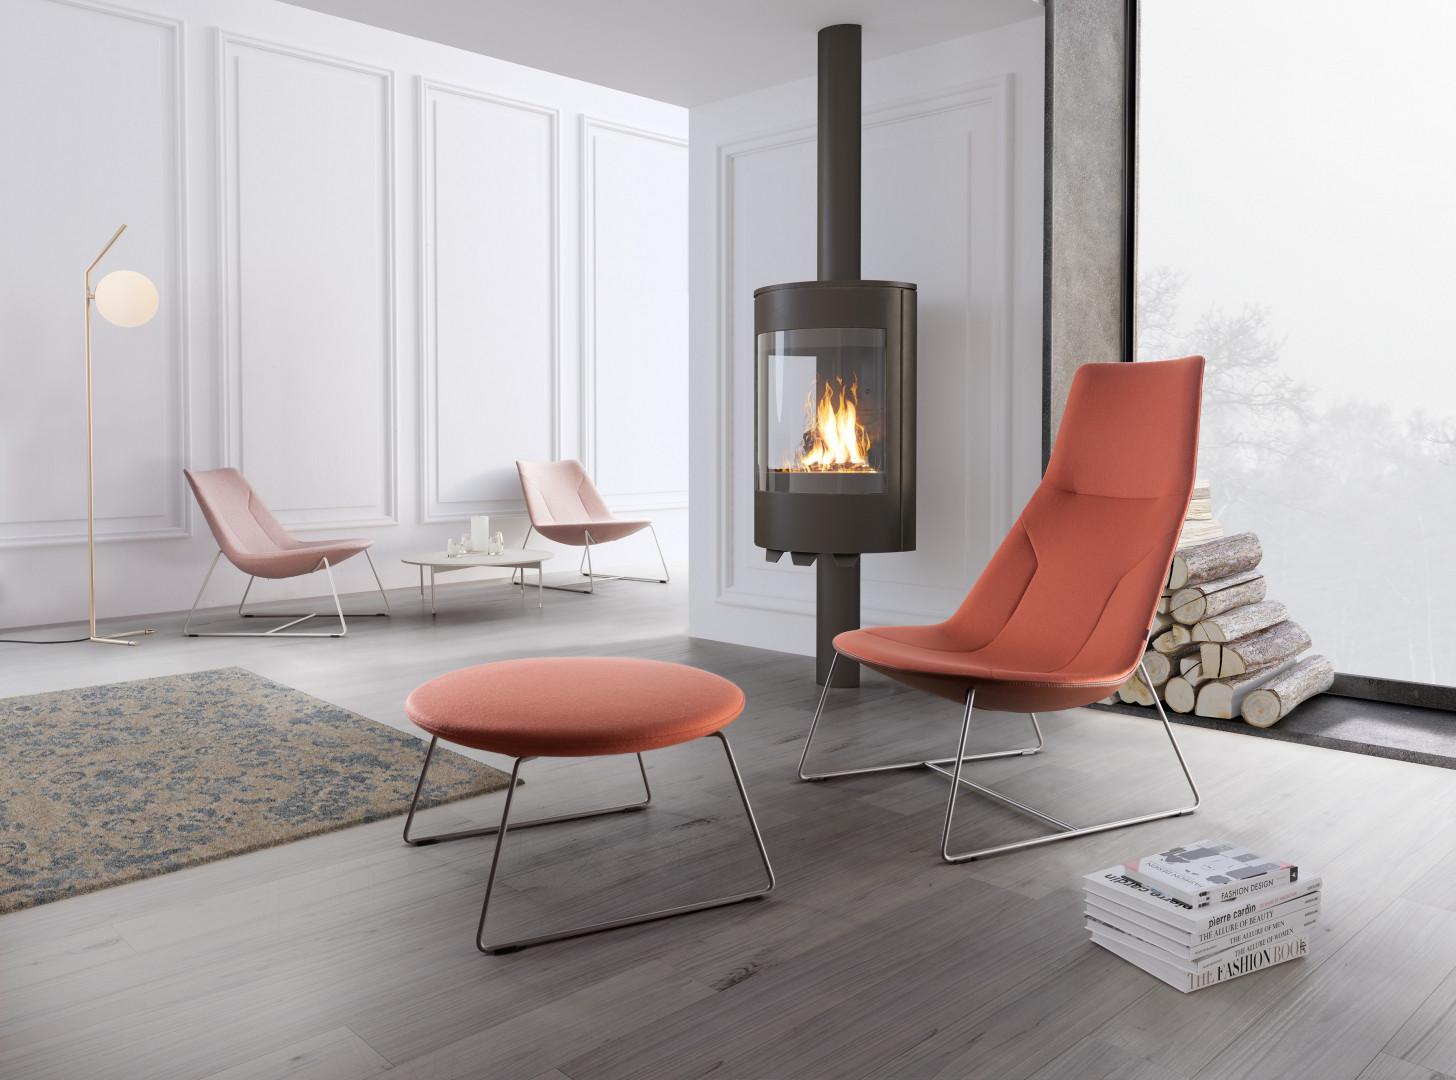 Chic Lounge - projekt Christophe Pillet dla Profim. Fot. Profim